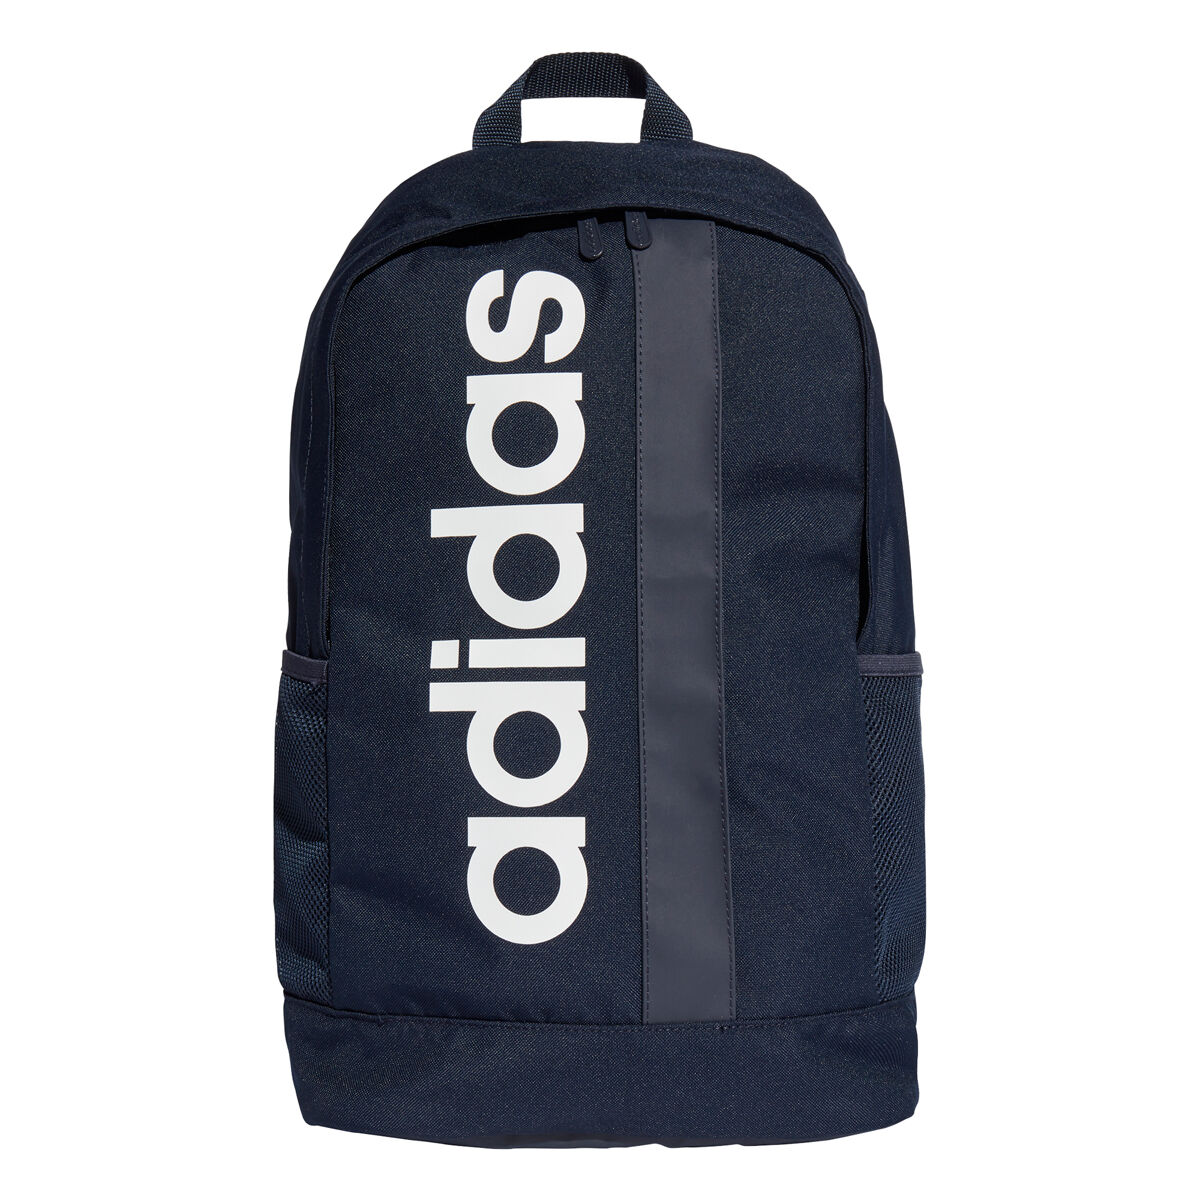 Adidas Orange Lin Per Bp Backpack Buy Adidas Orange Lin